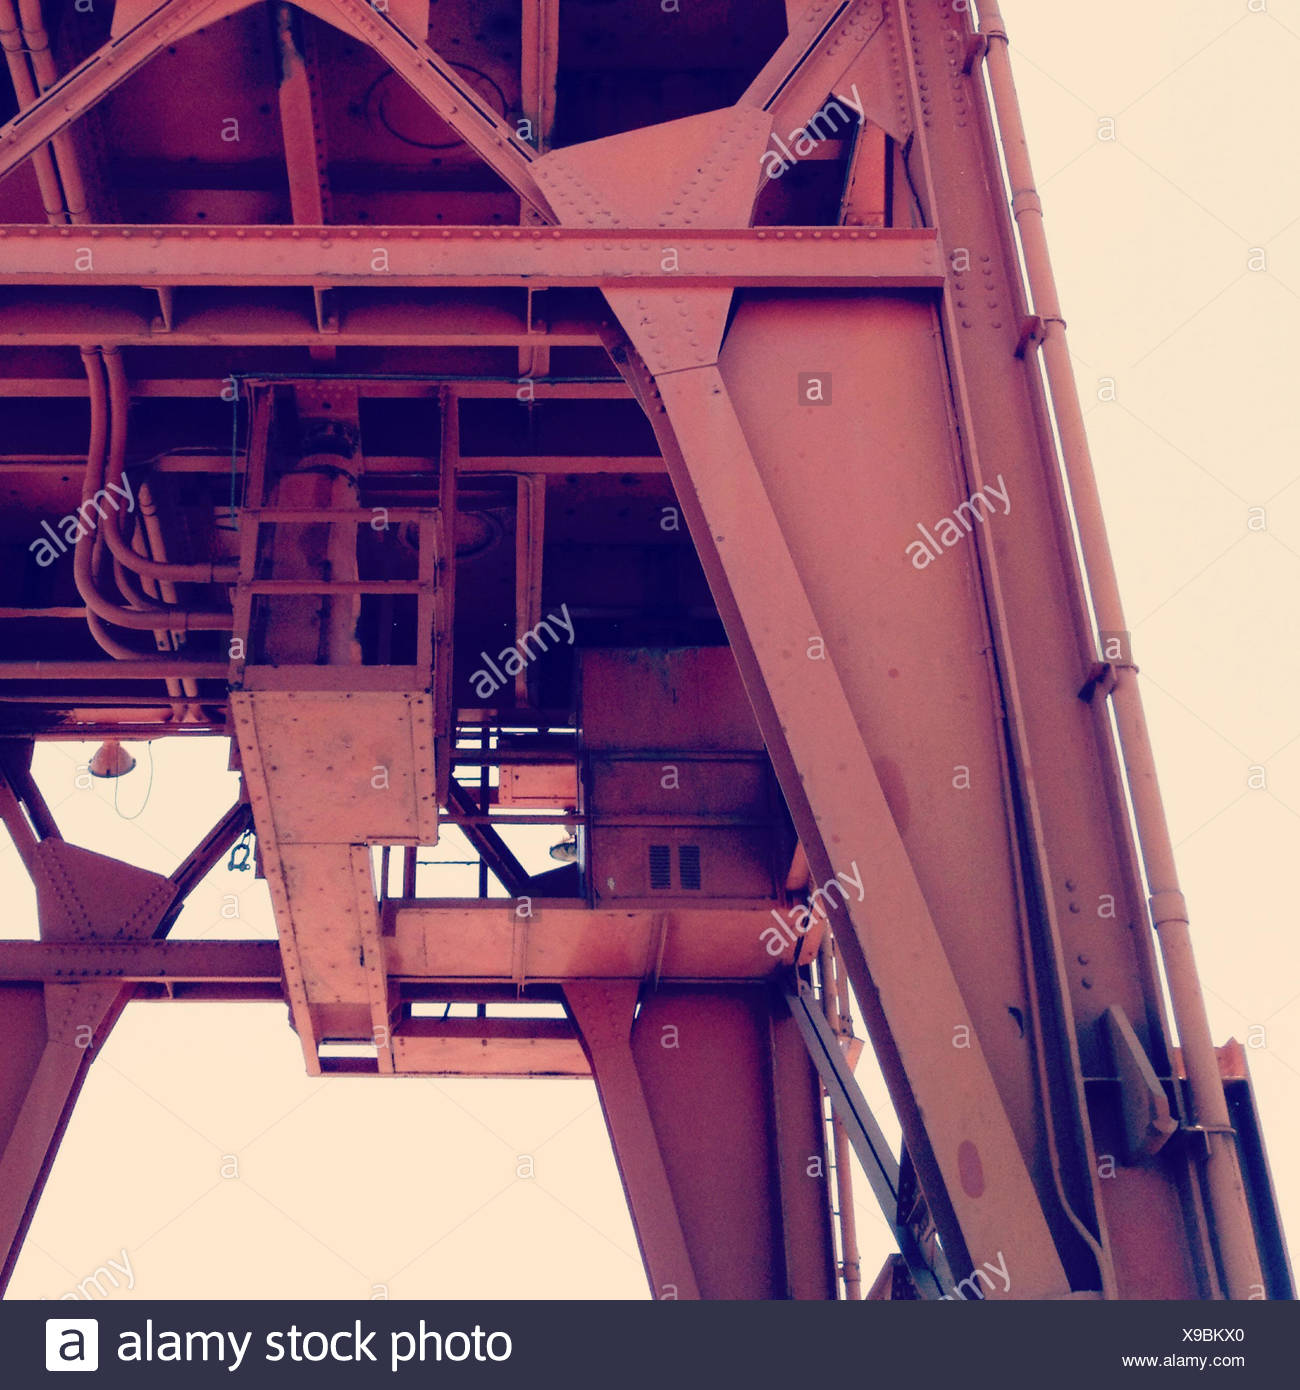 États-unis, Californie, Vallejo, Mare Island, vue de grue industrielle Photo Stock